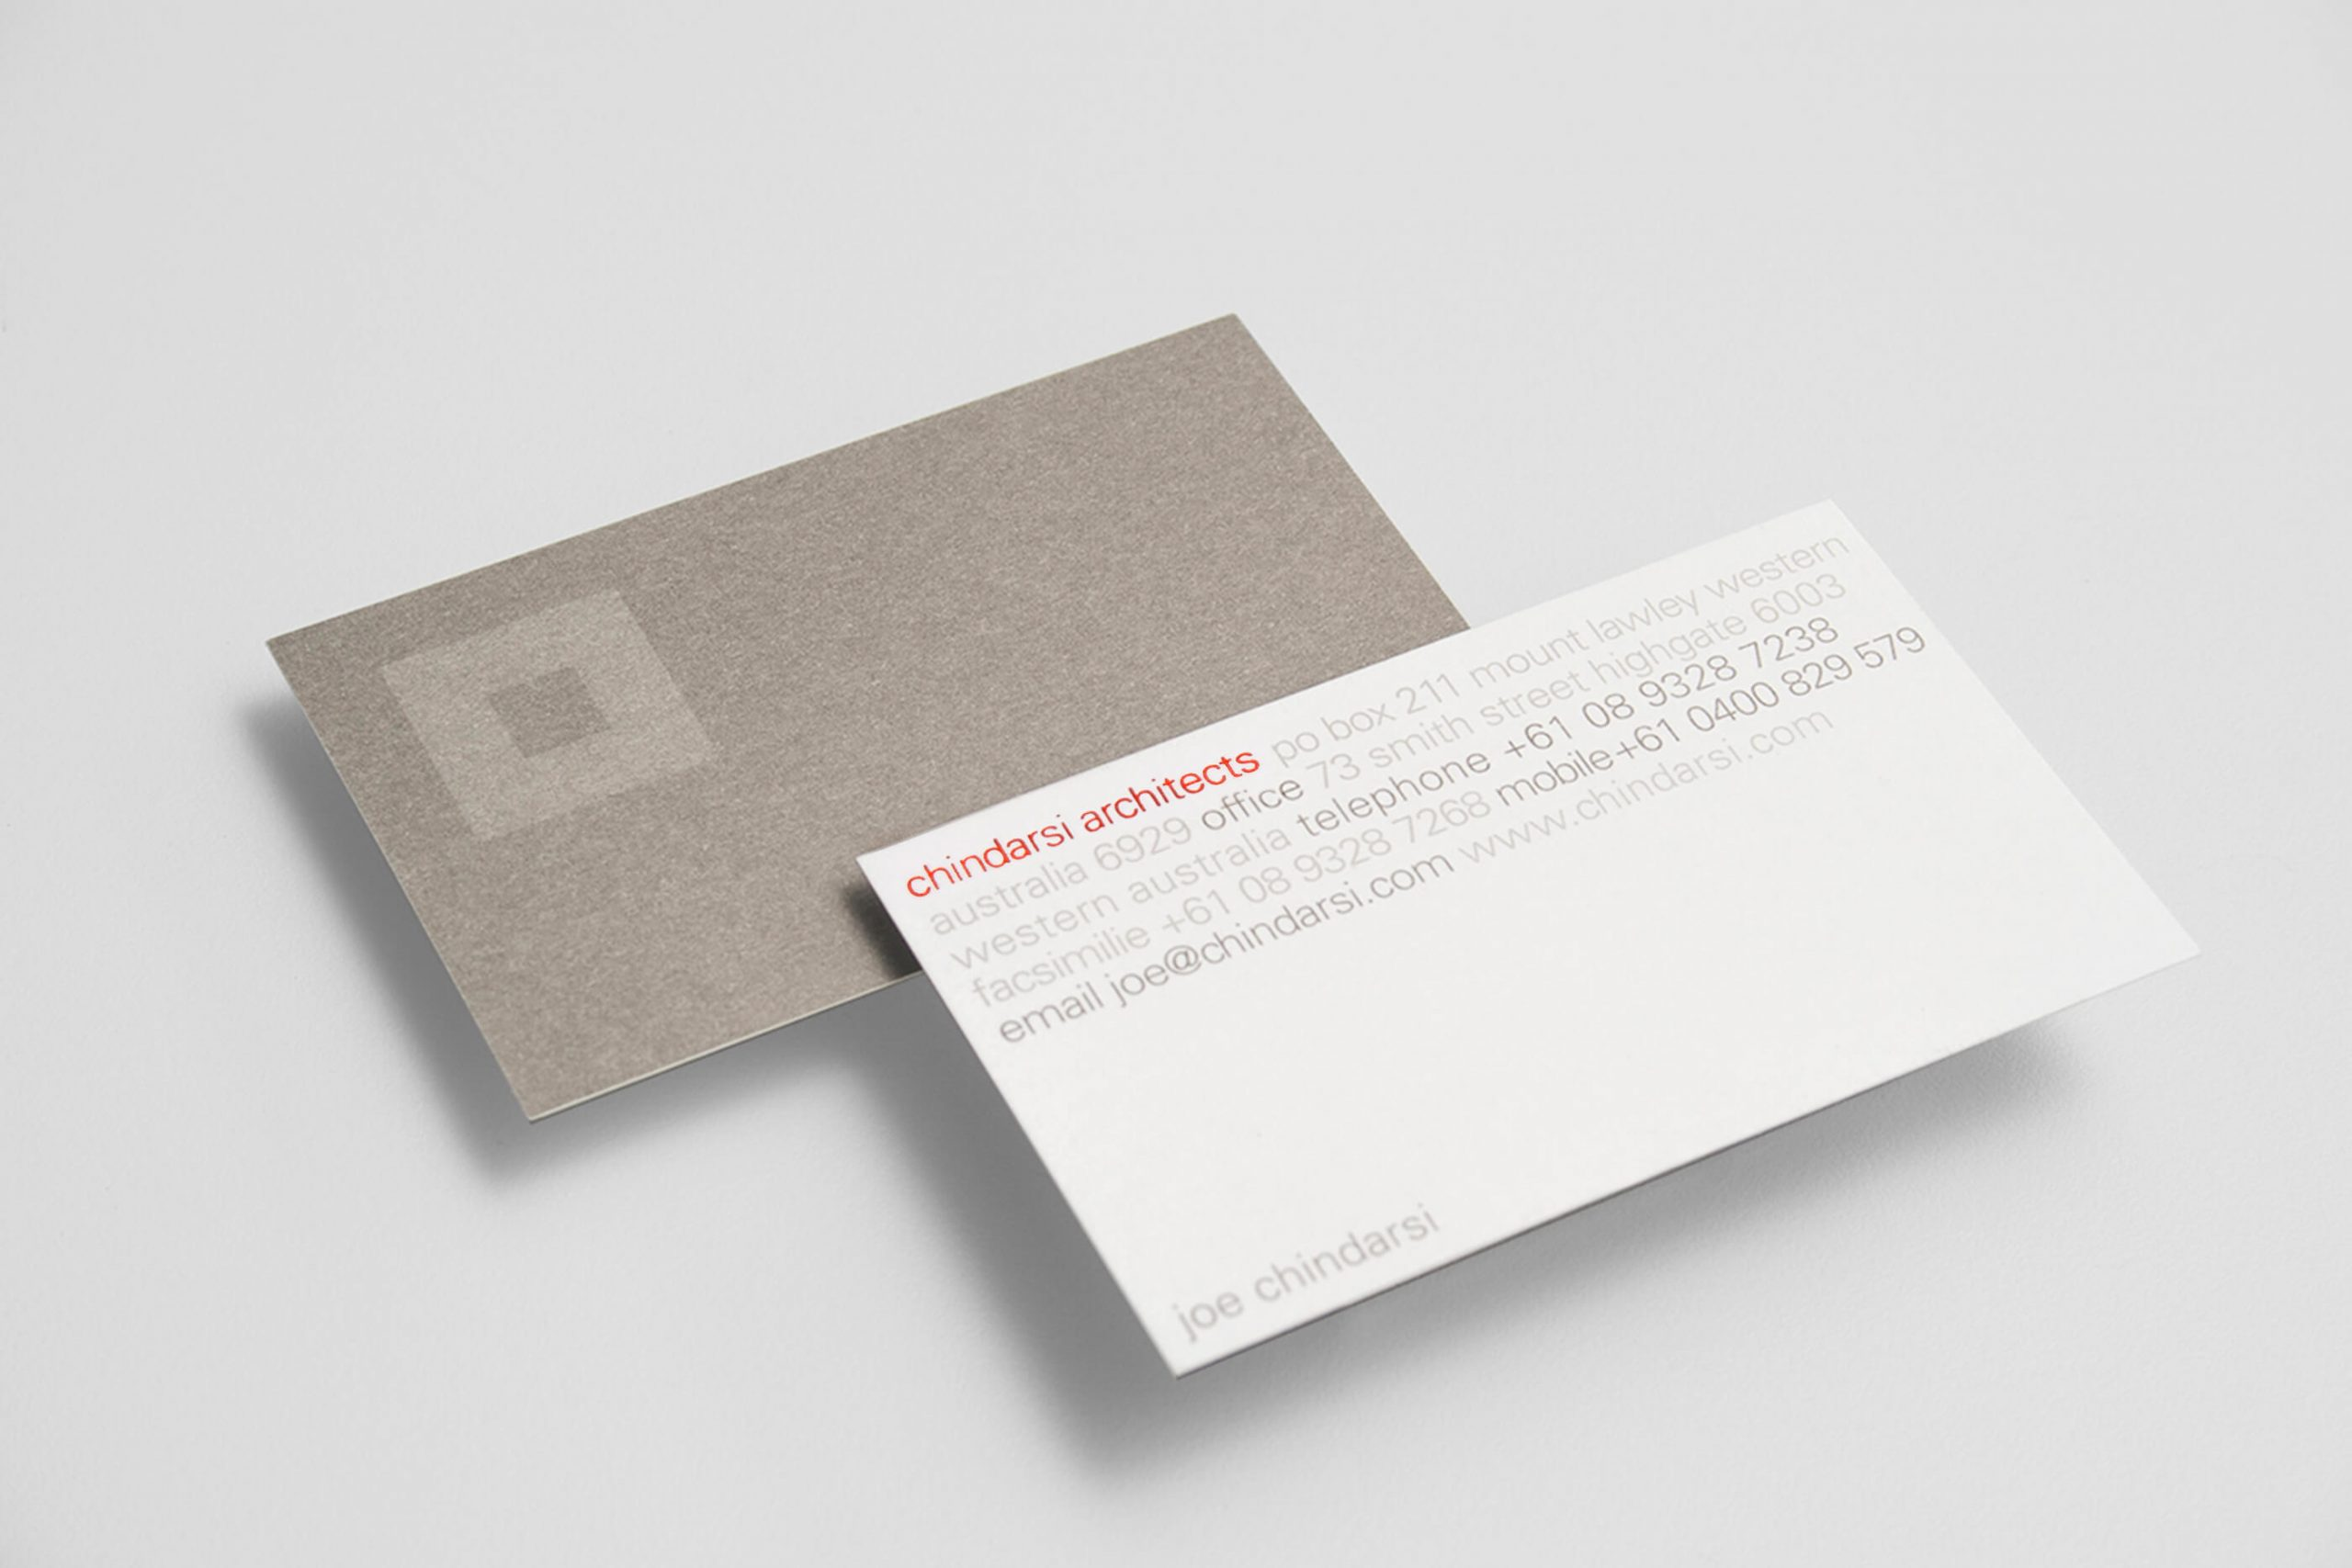 chindarsi_architects_card